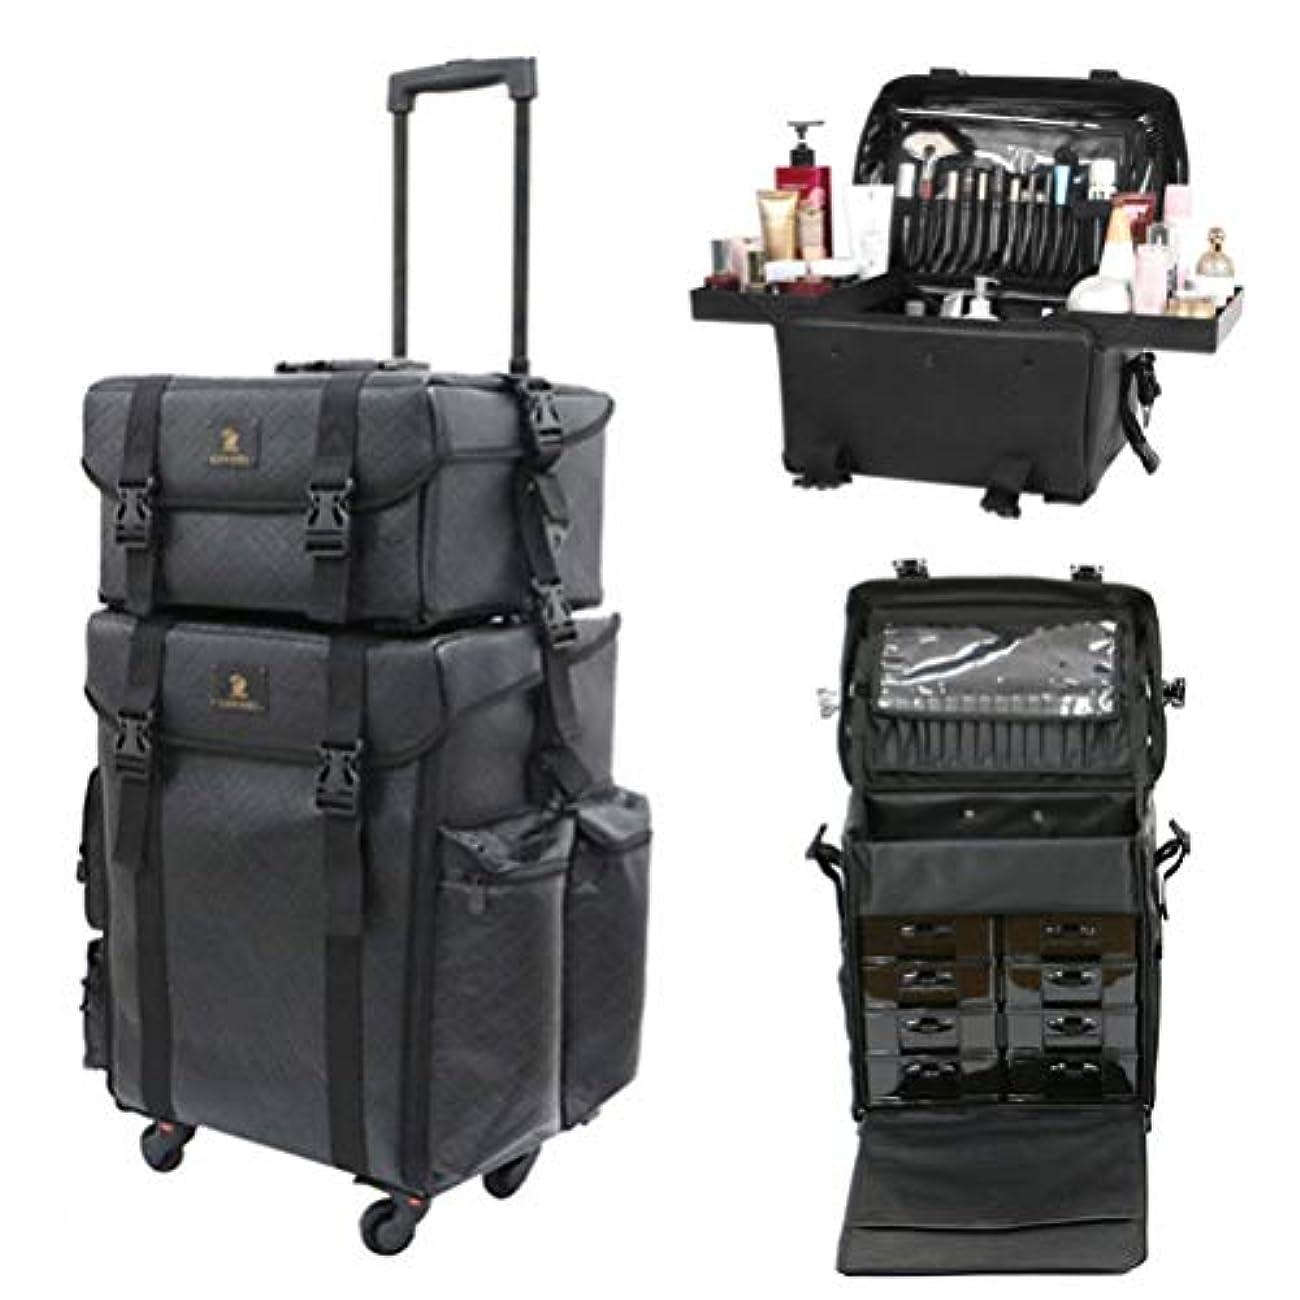 LUVODI メイクボックス 大容量 プロ コスメボックス 旅行 引き出し 化粧品収納 メイクキャリーケース 美容師 化粧箱 防水 レザー 黒